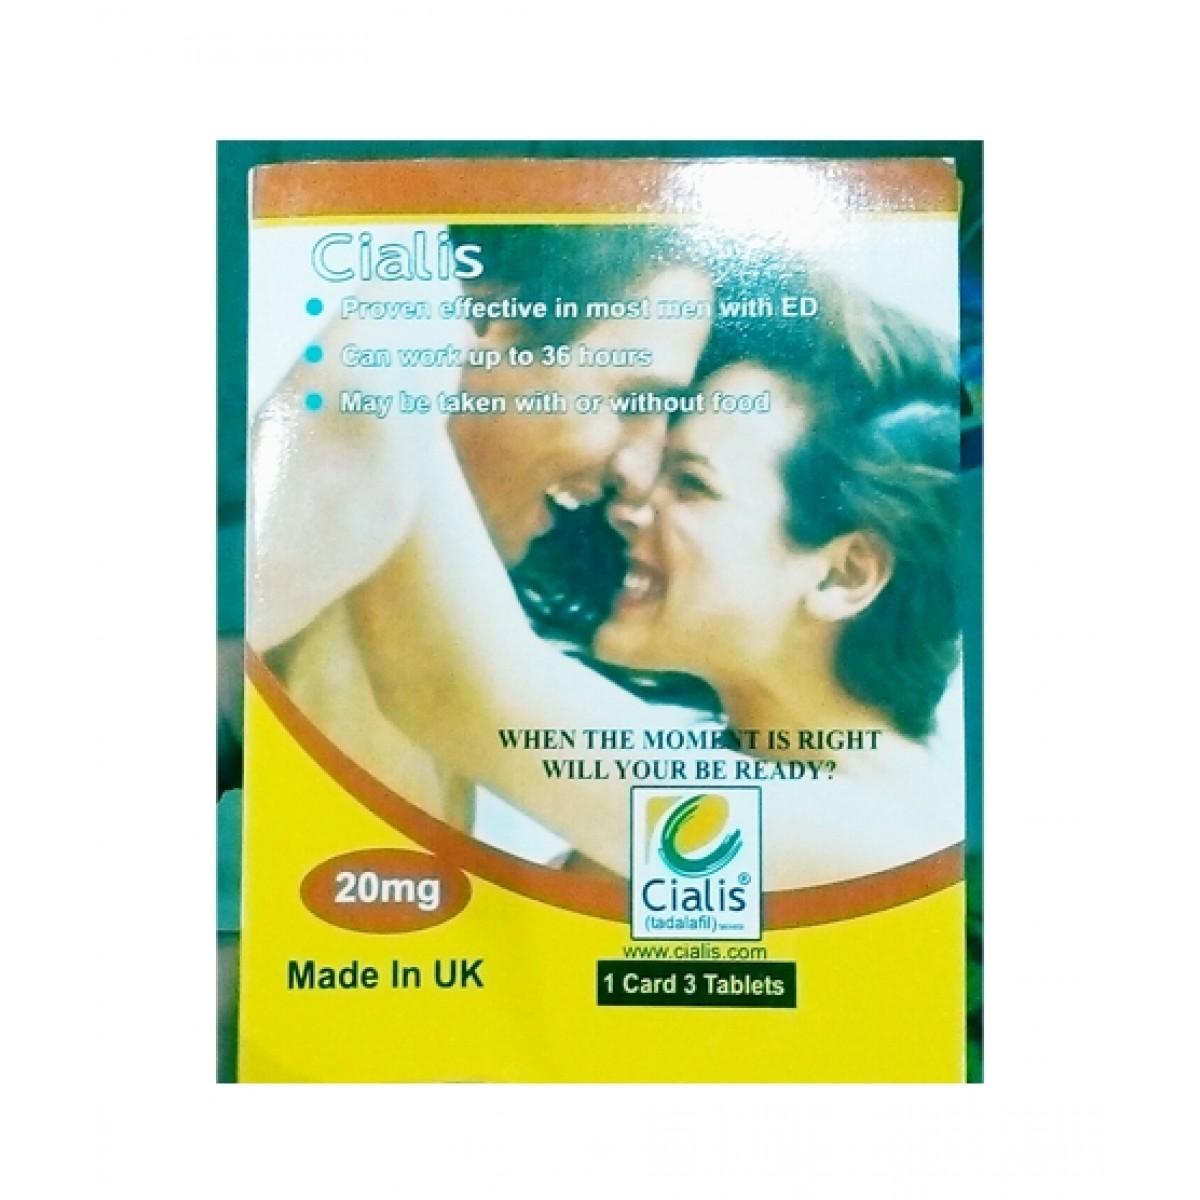 Kk Online Cialis Pack Of 3 Tablets Price In Pakistan Buy Kk Online Cialis Pack Of 3 Tablets 20mg Ishopping Pk